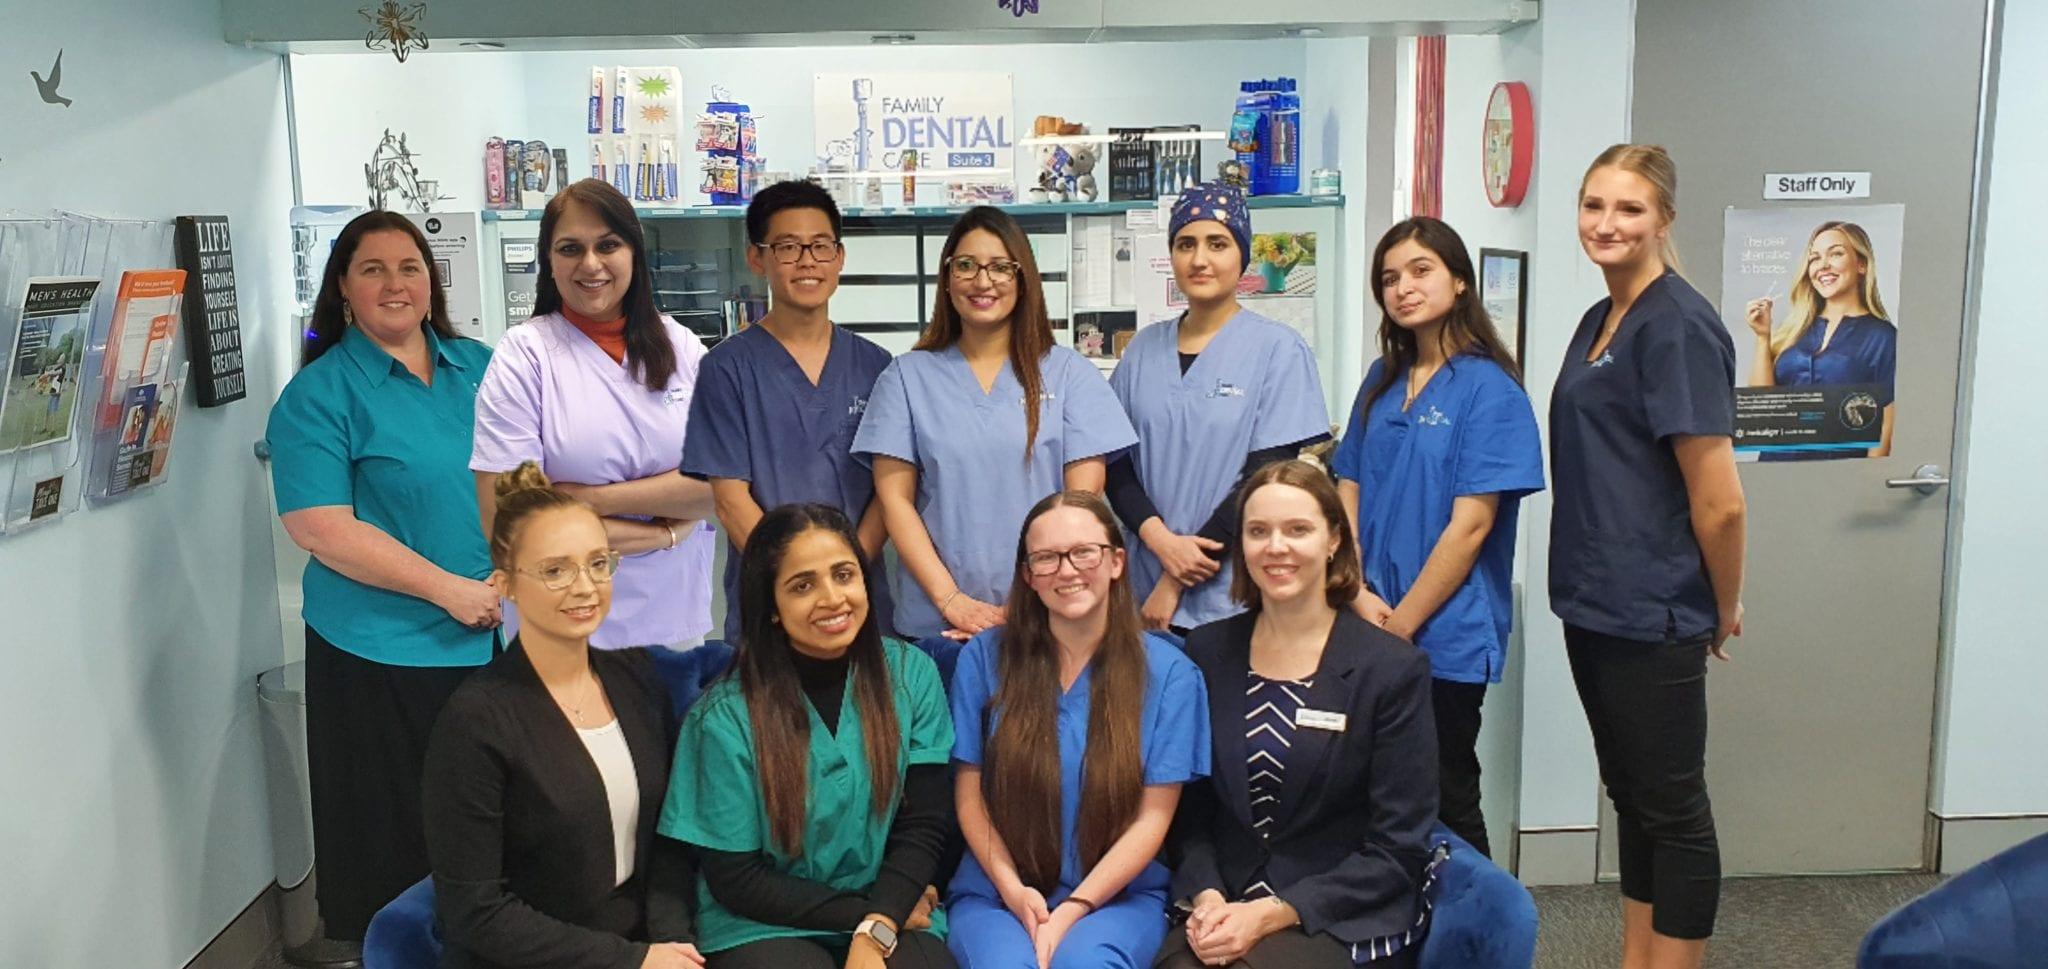 Campbelltown Family Dental Care Full Group team photo